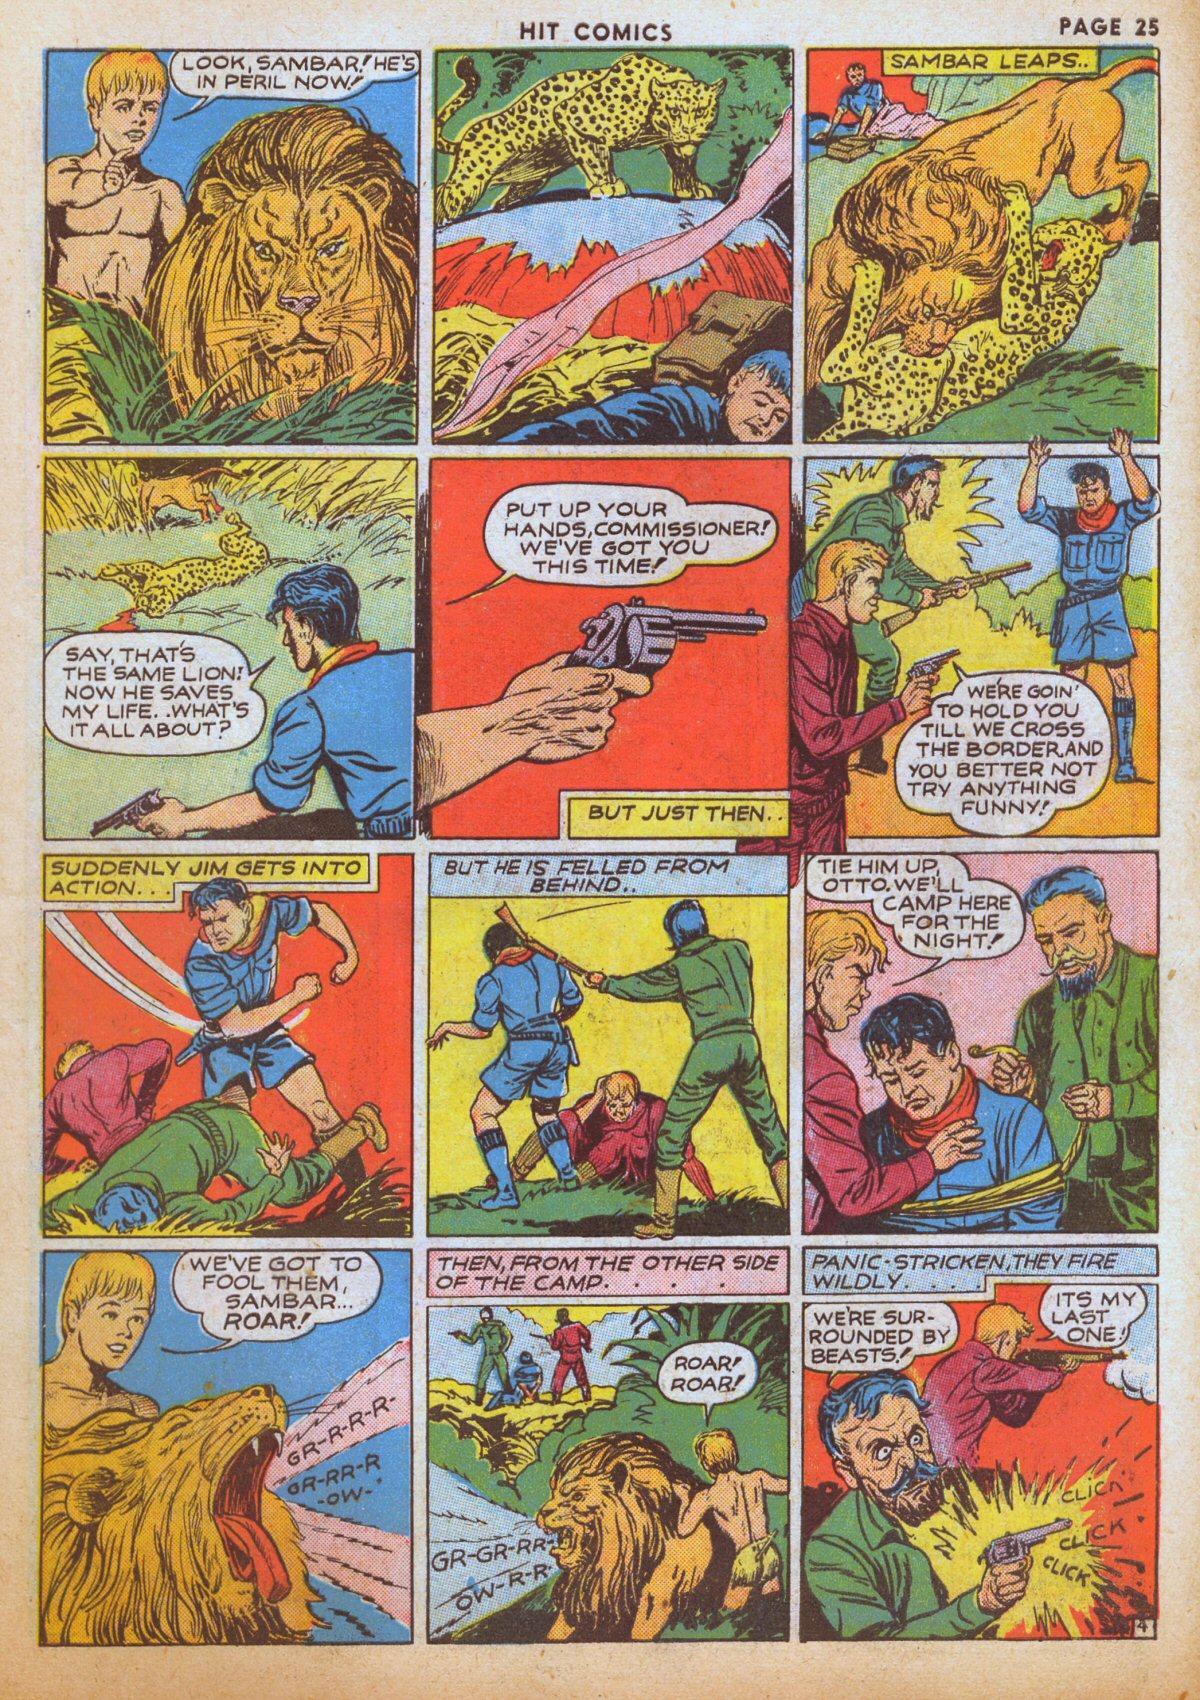 Read online Hit Comics comic -  Issue #12 - 27